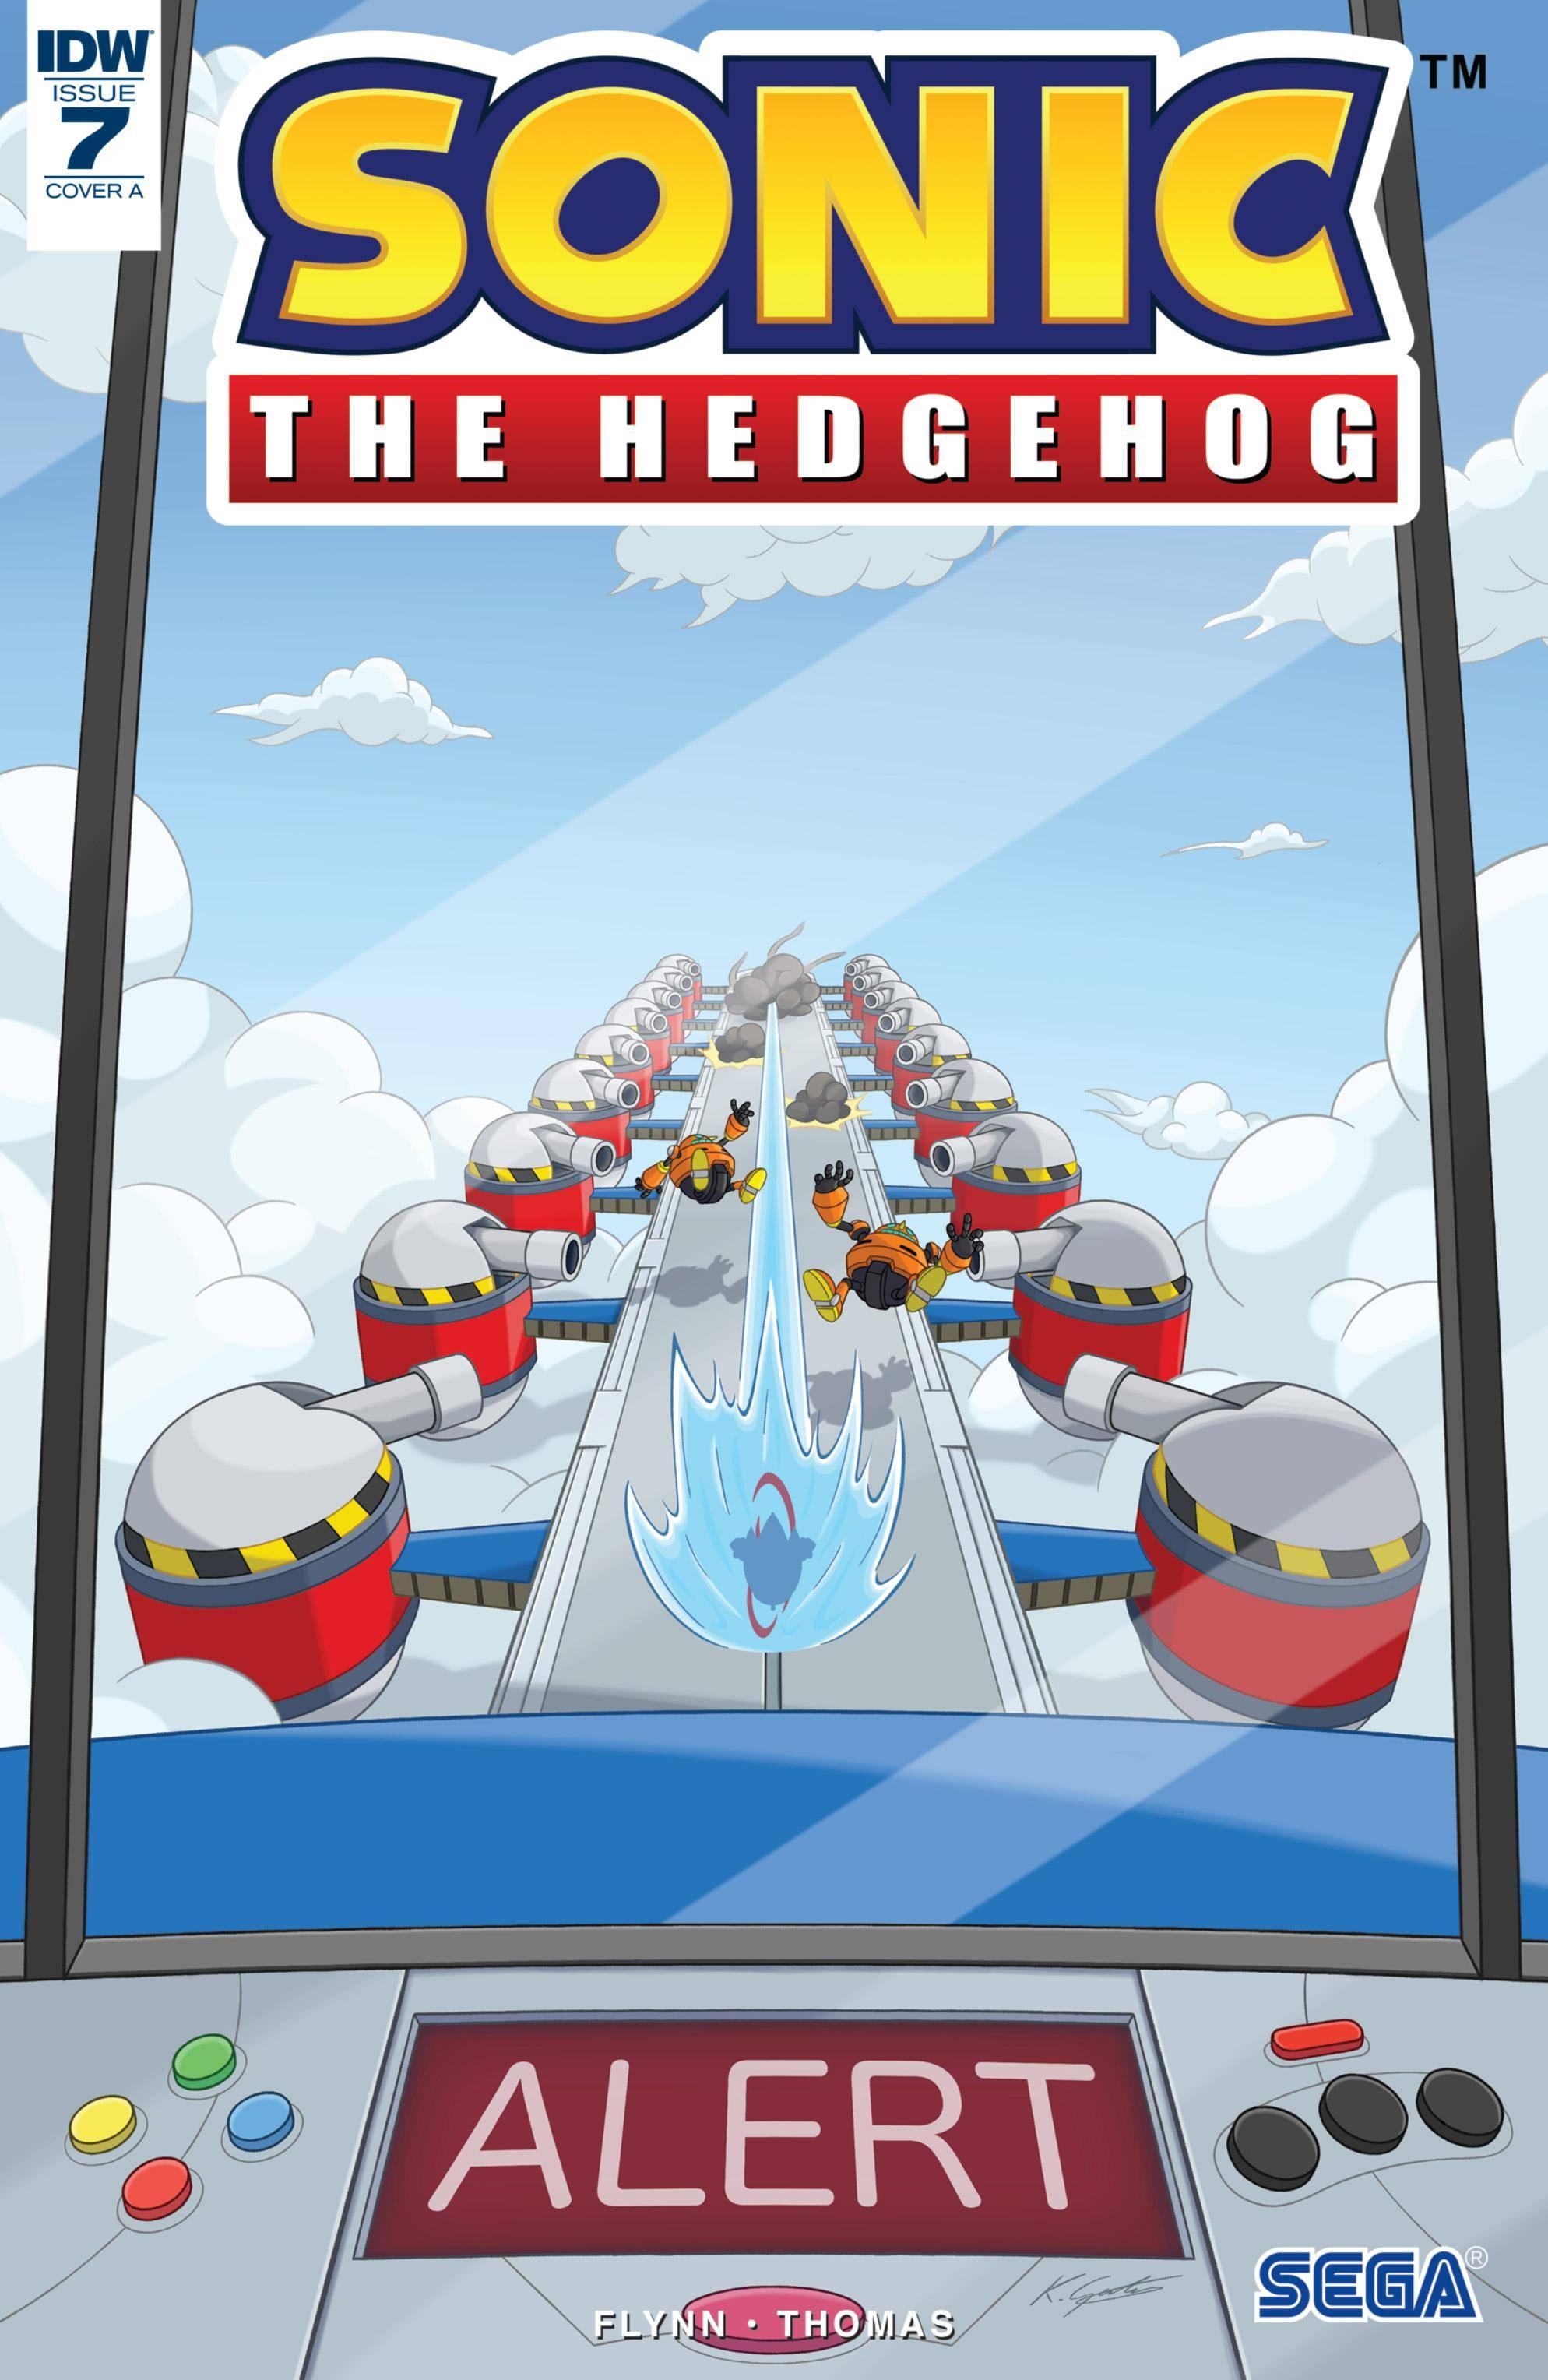 Sonic The Hedgehog 007 2018 Digital AnHeroGold